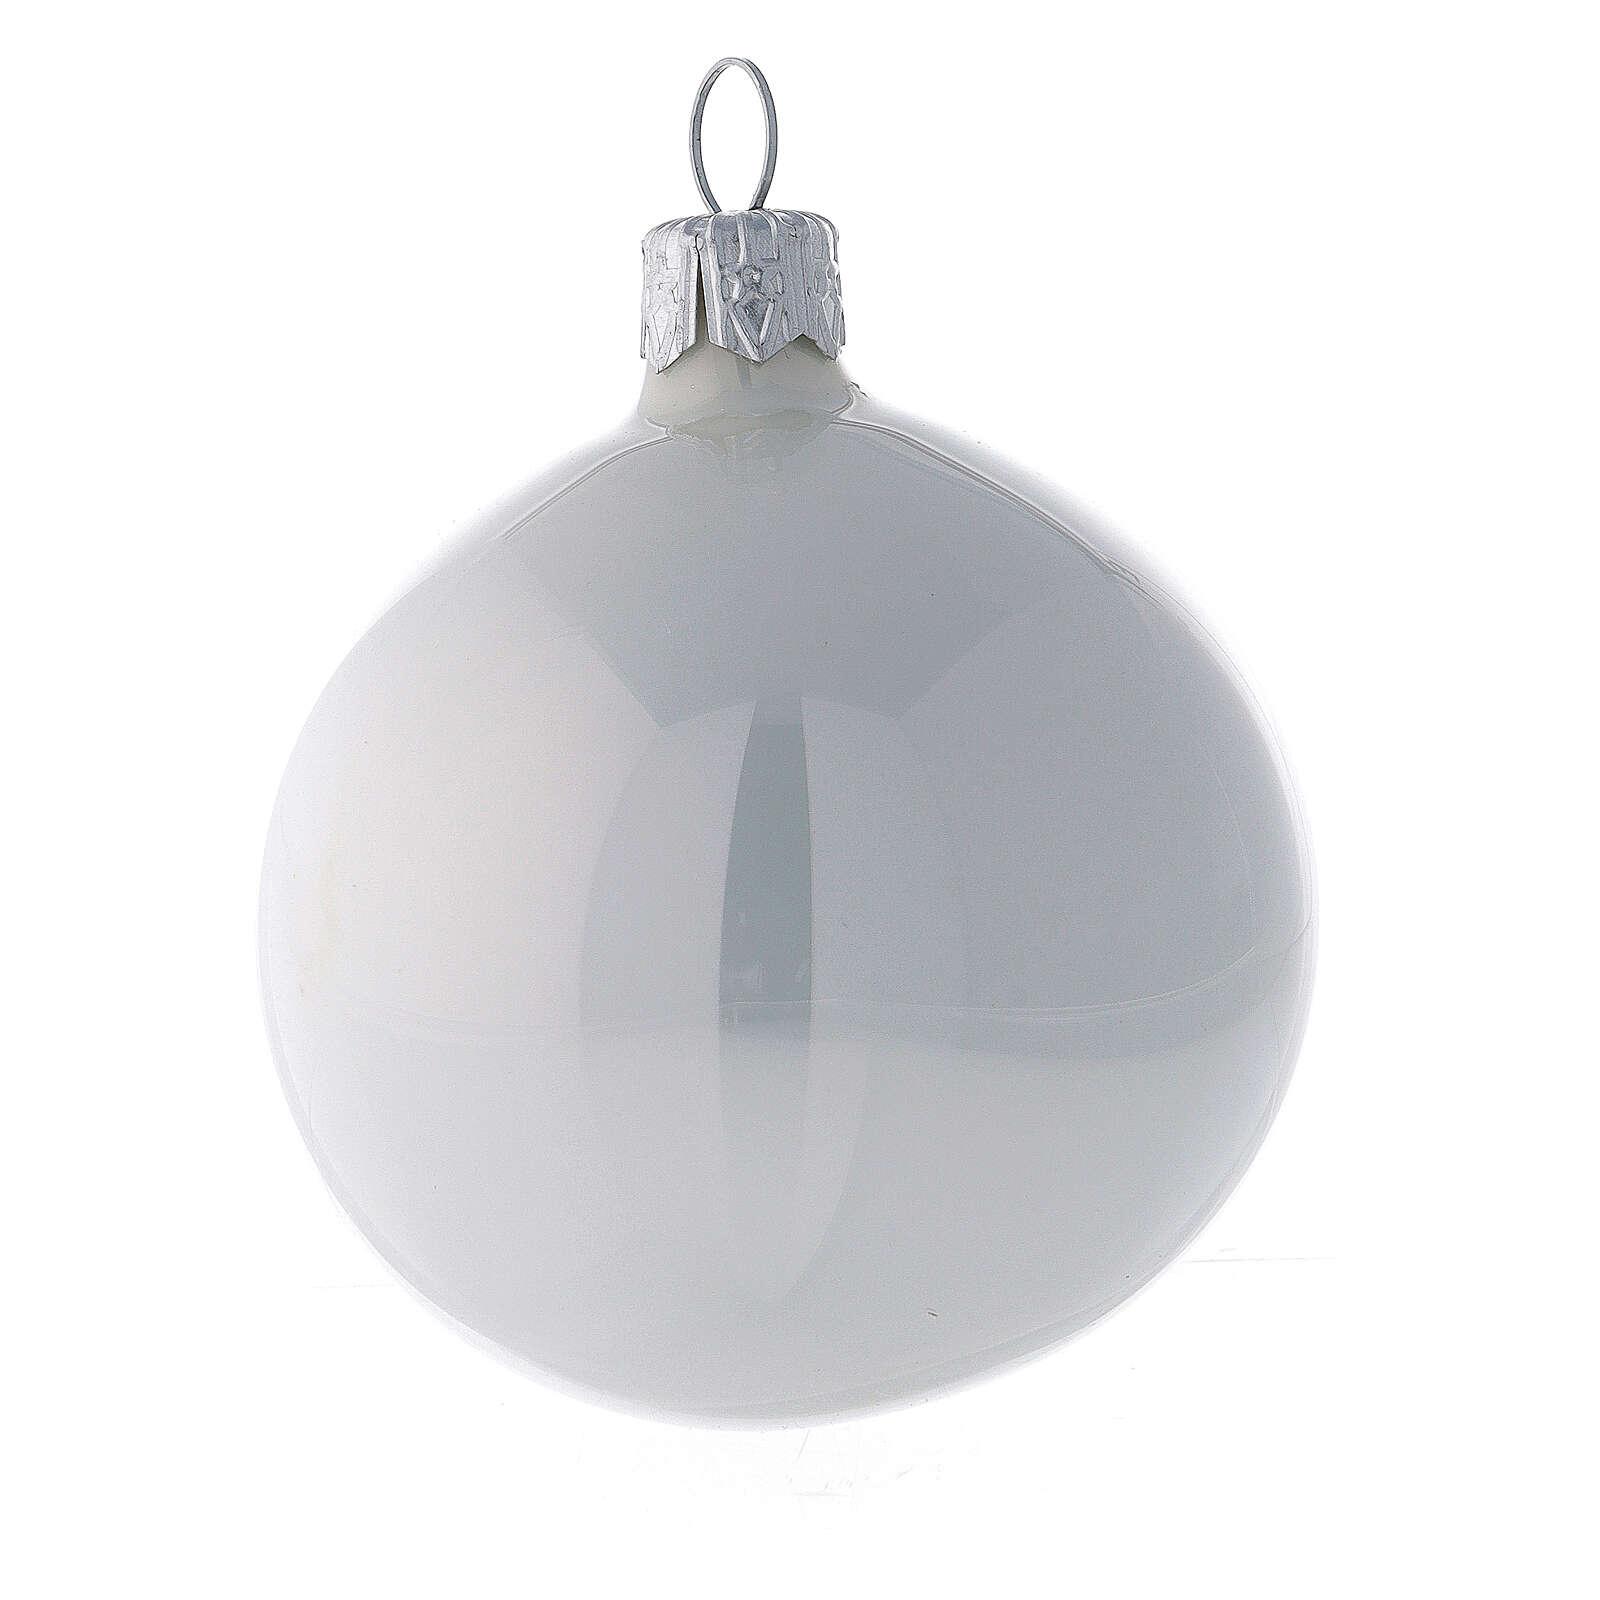 Blown glass Christmas balls shiny white pearl 6 pcs 60 mm 4